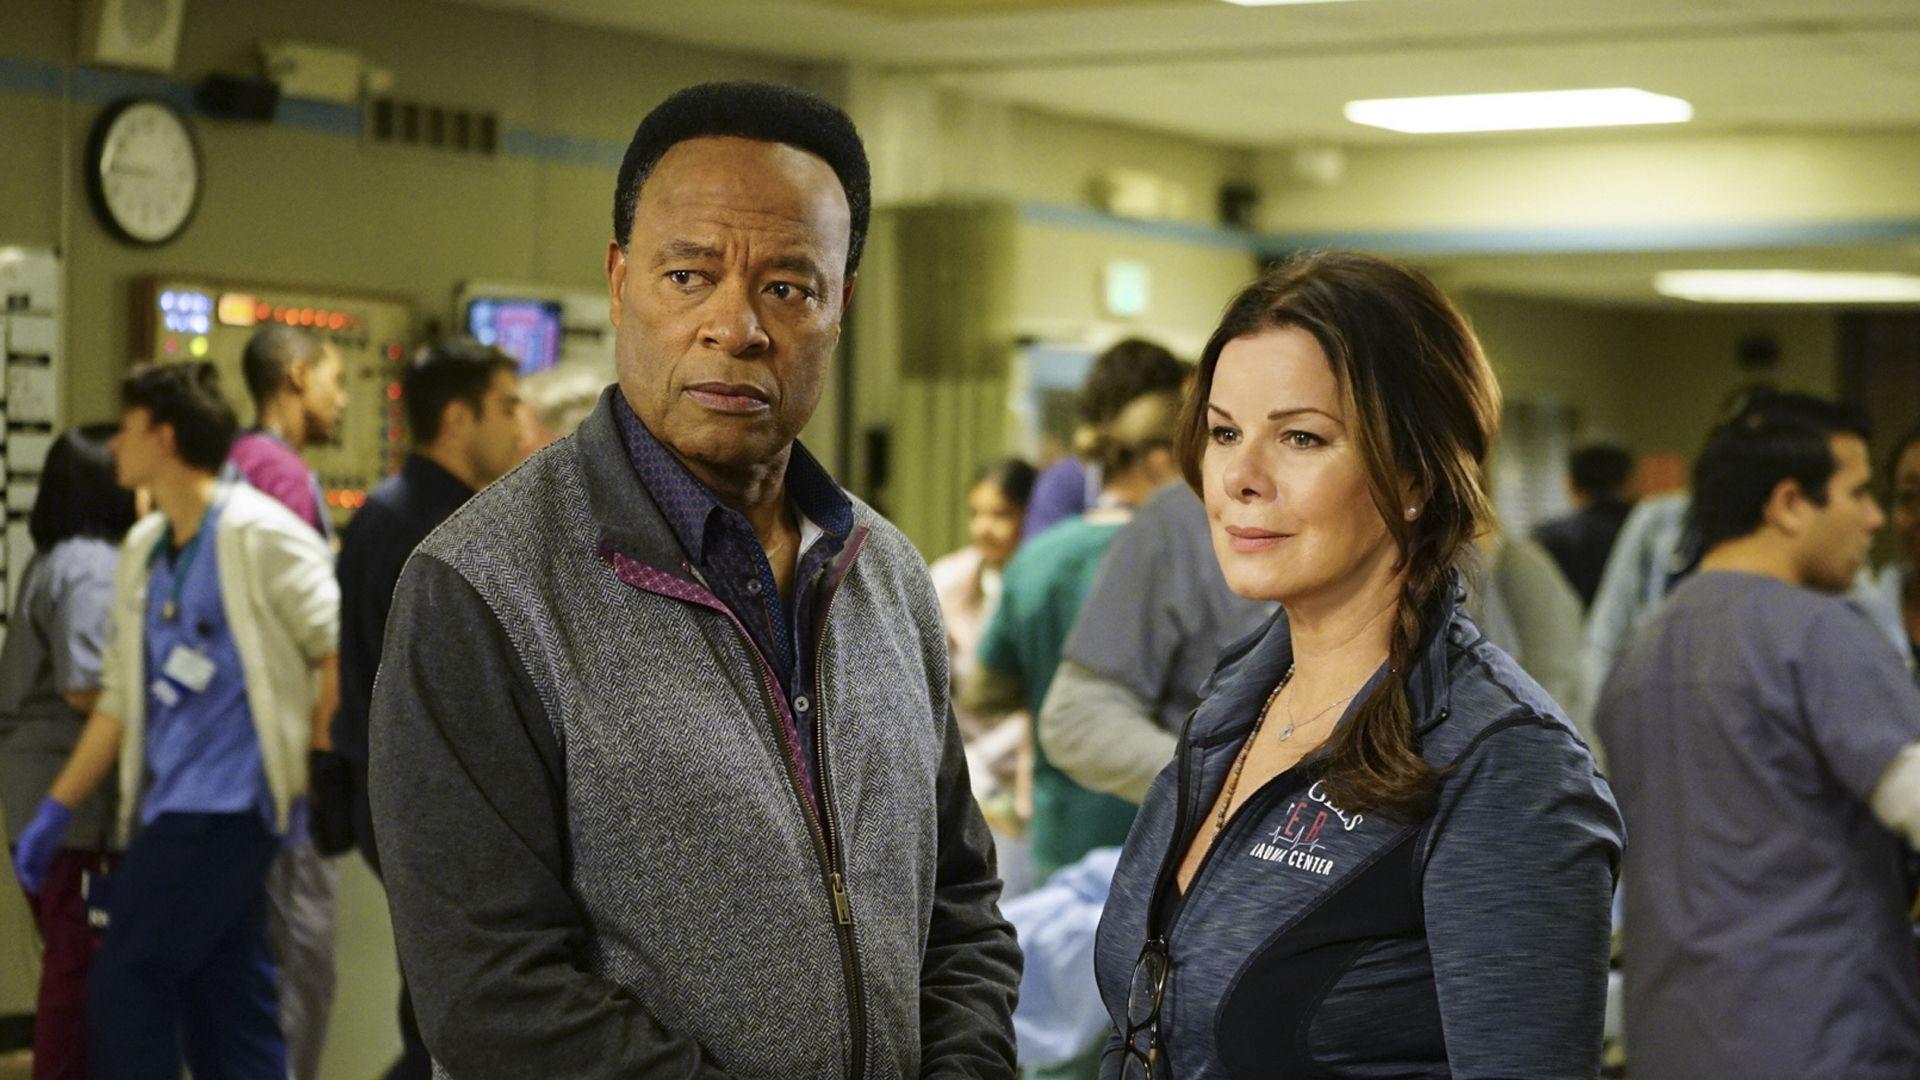 code black season 2 episode 2 online free